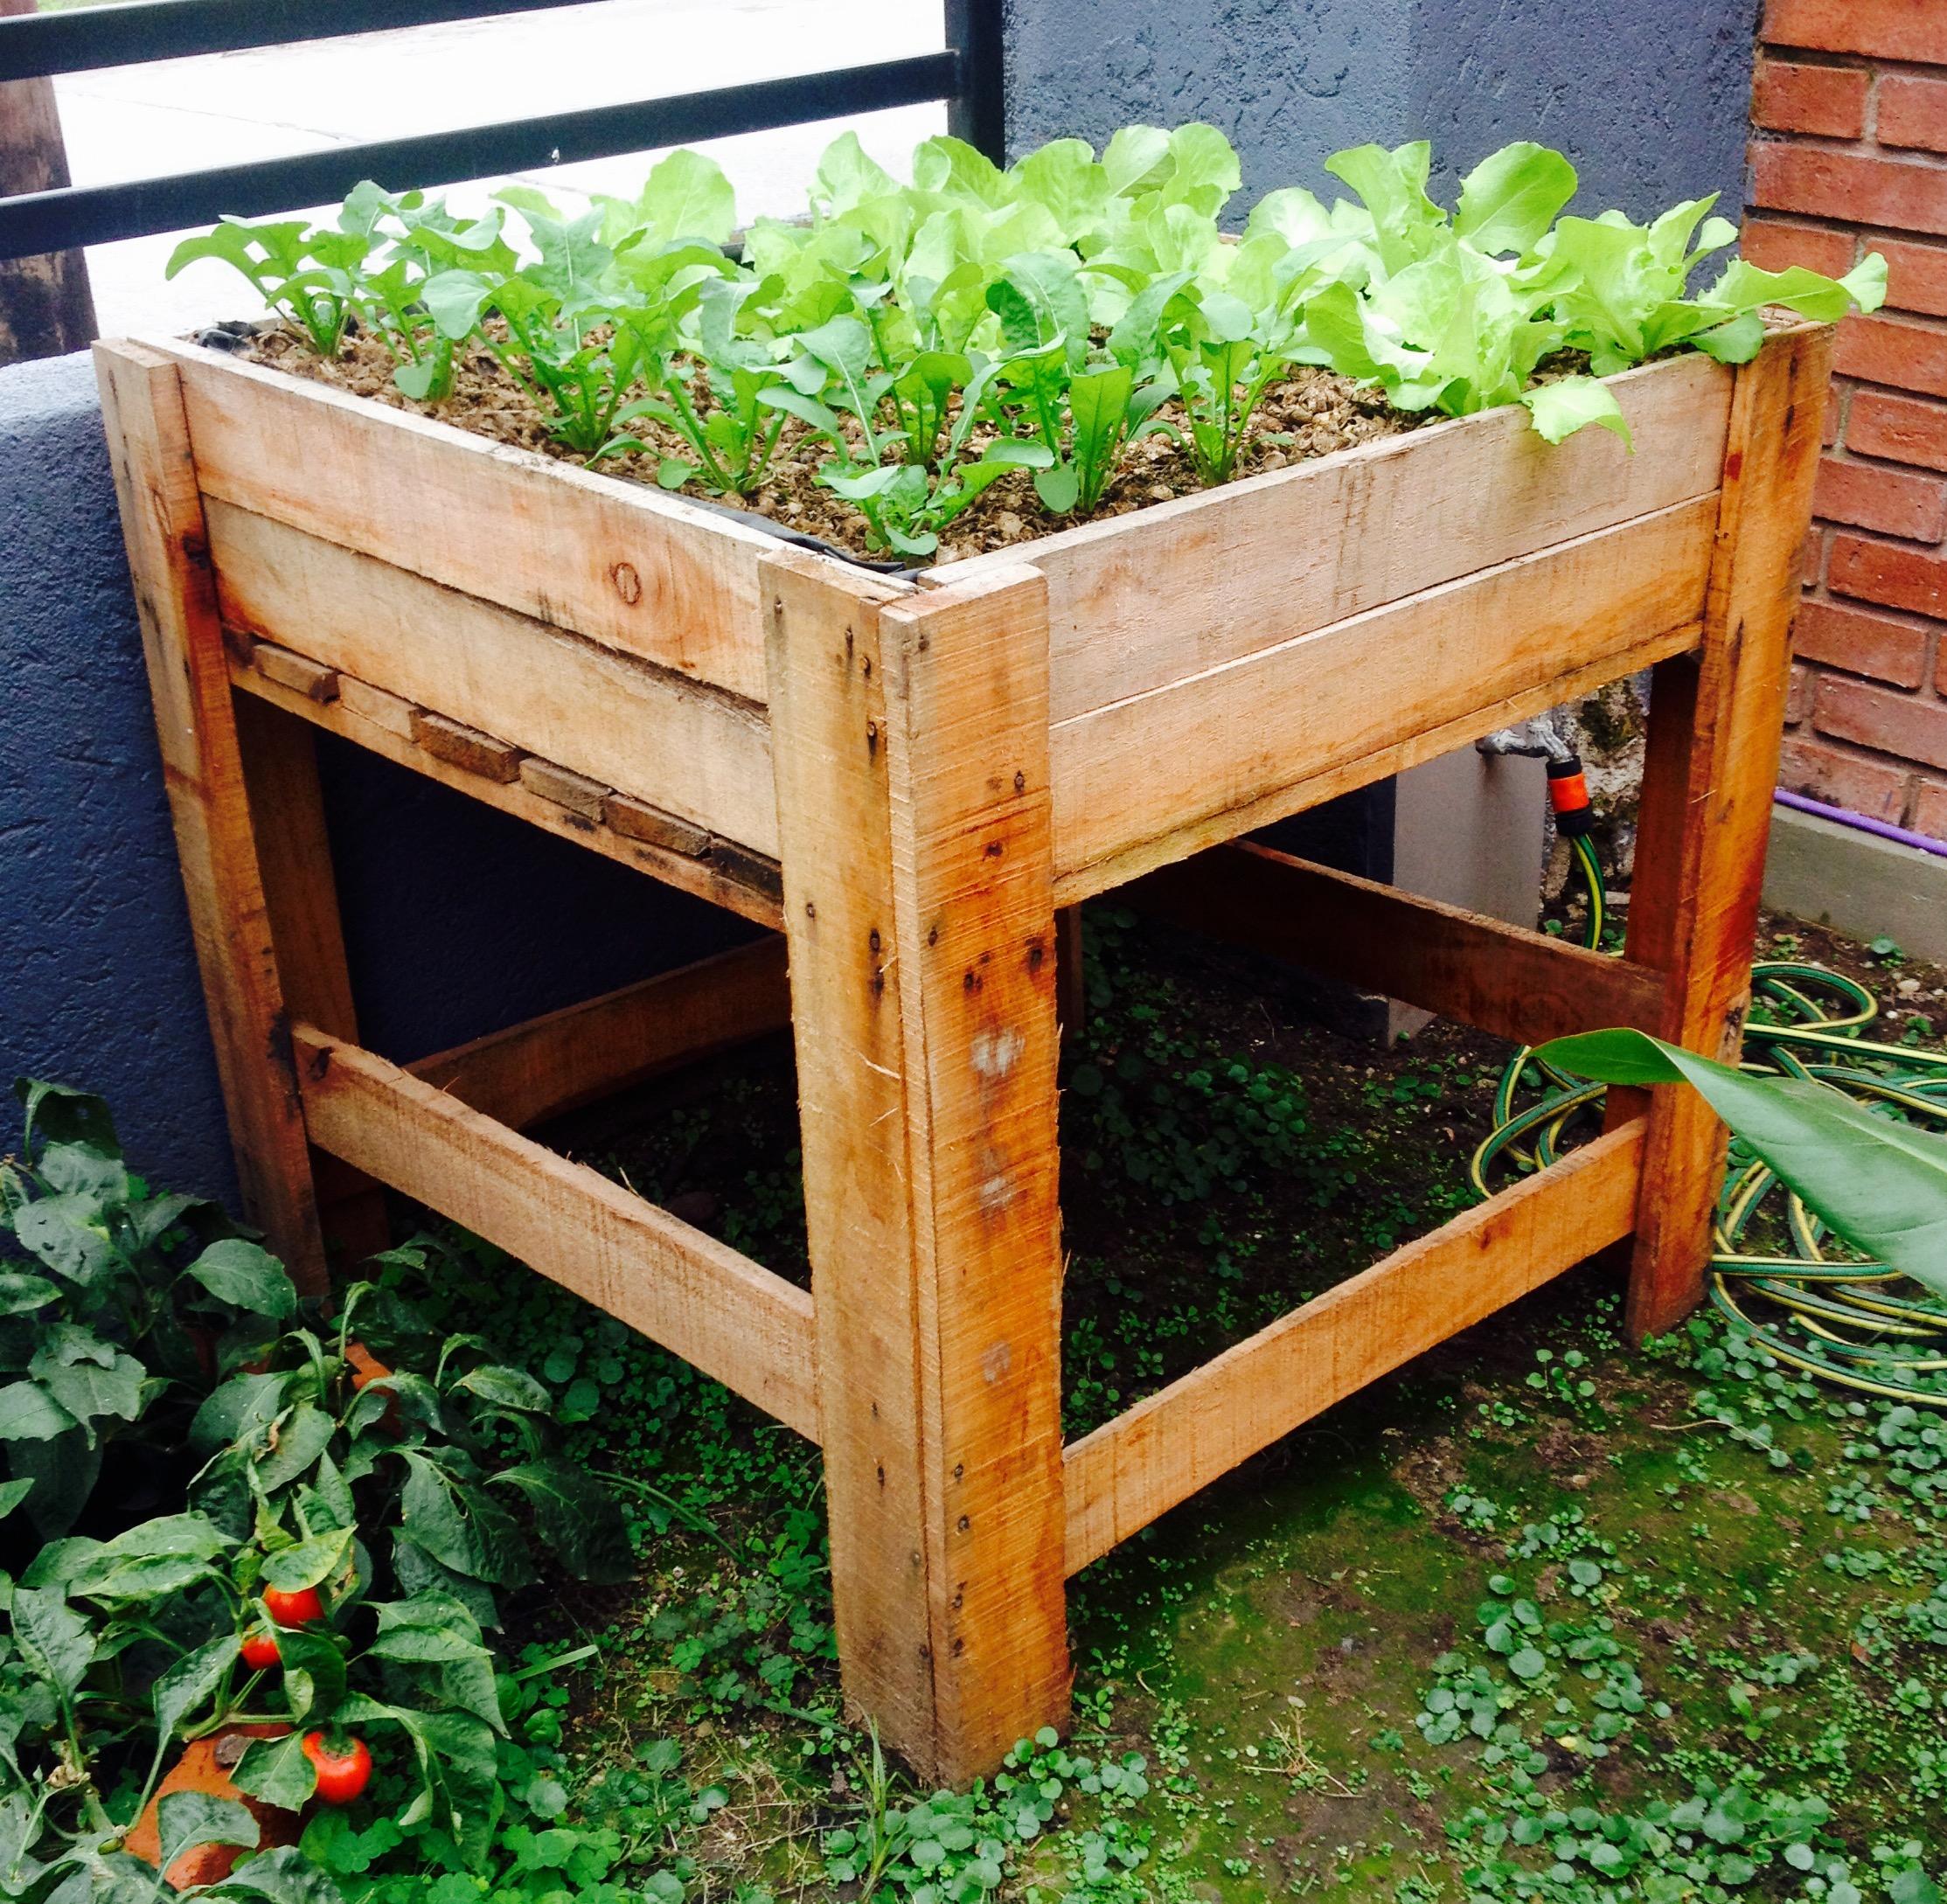 Raised beds for fresh produce in Córdoba, Argentina